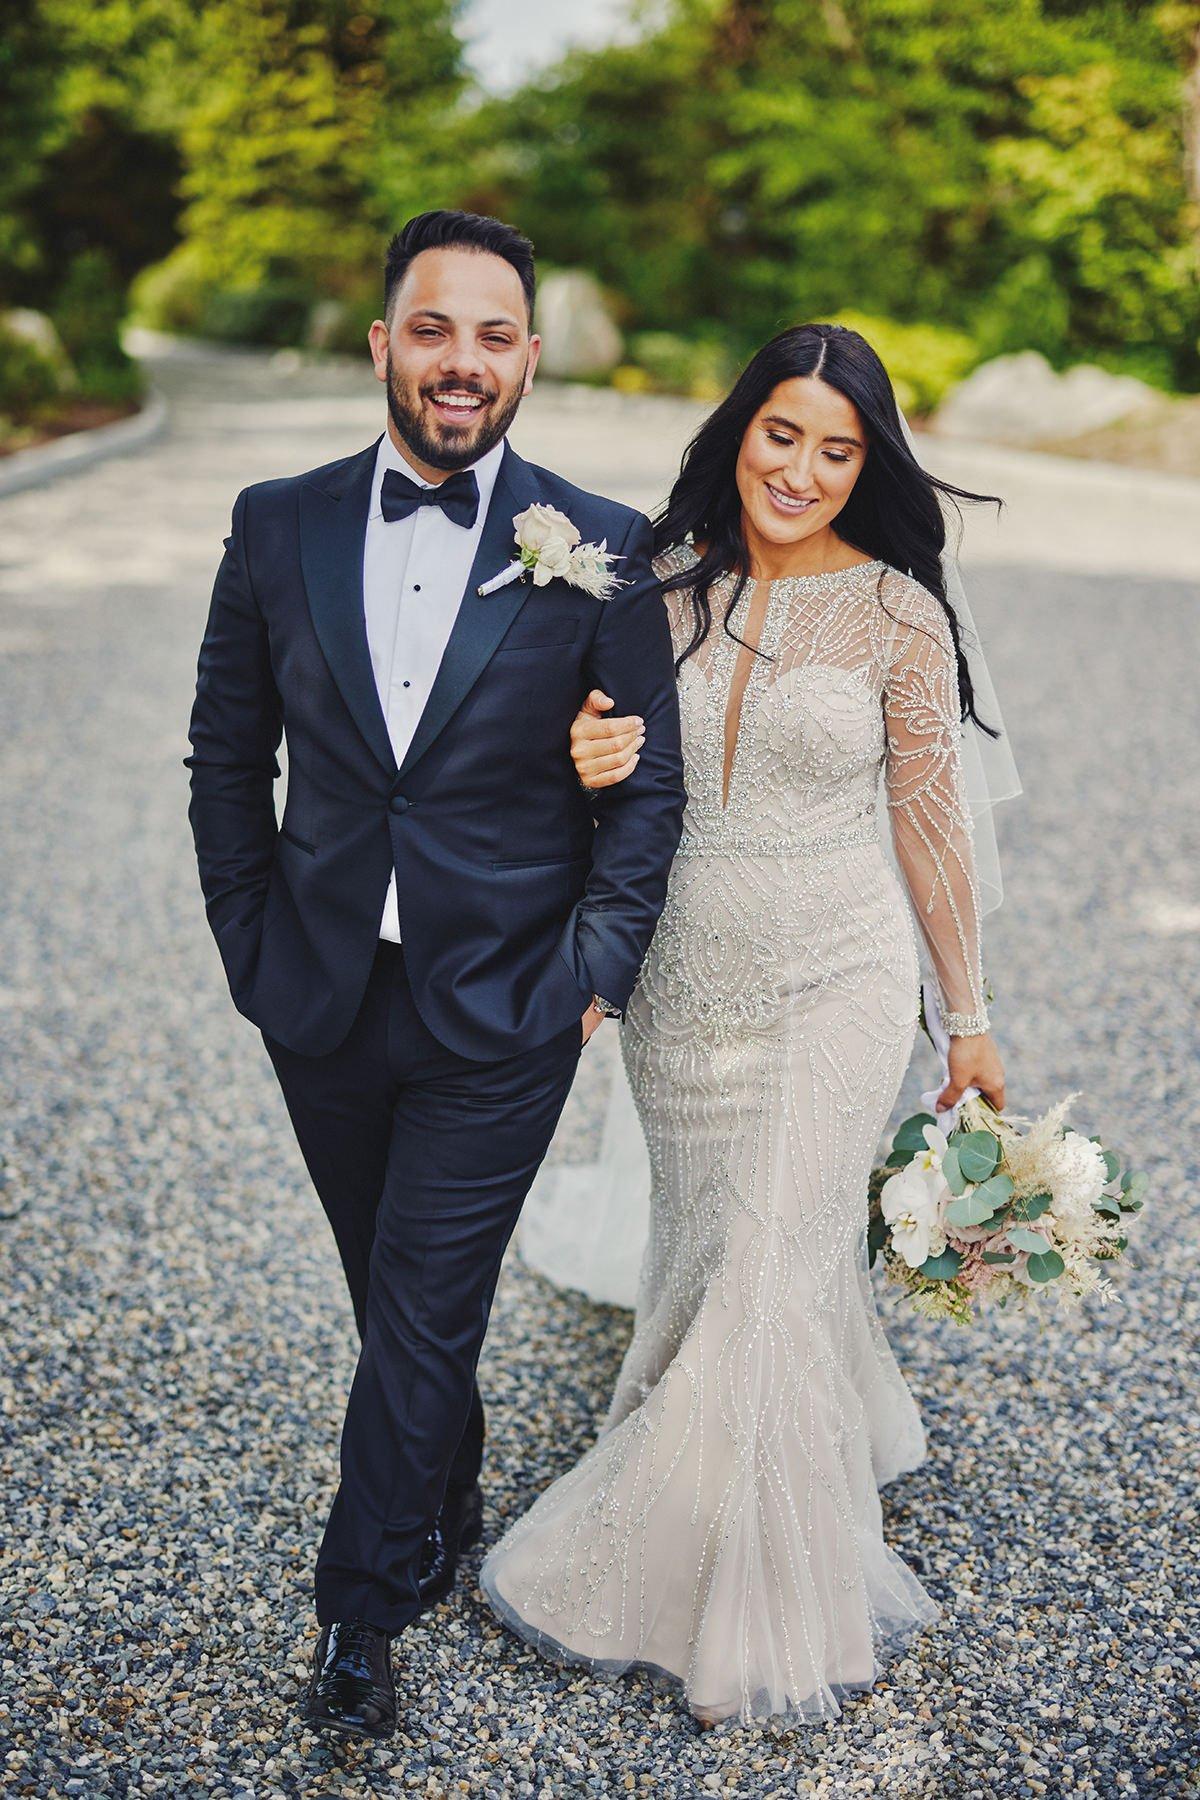 Wedding at Ballykealey House Barn 3